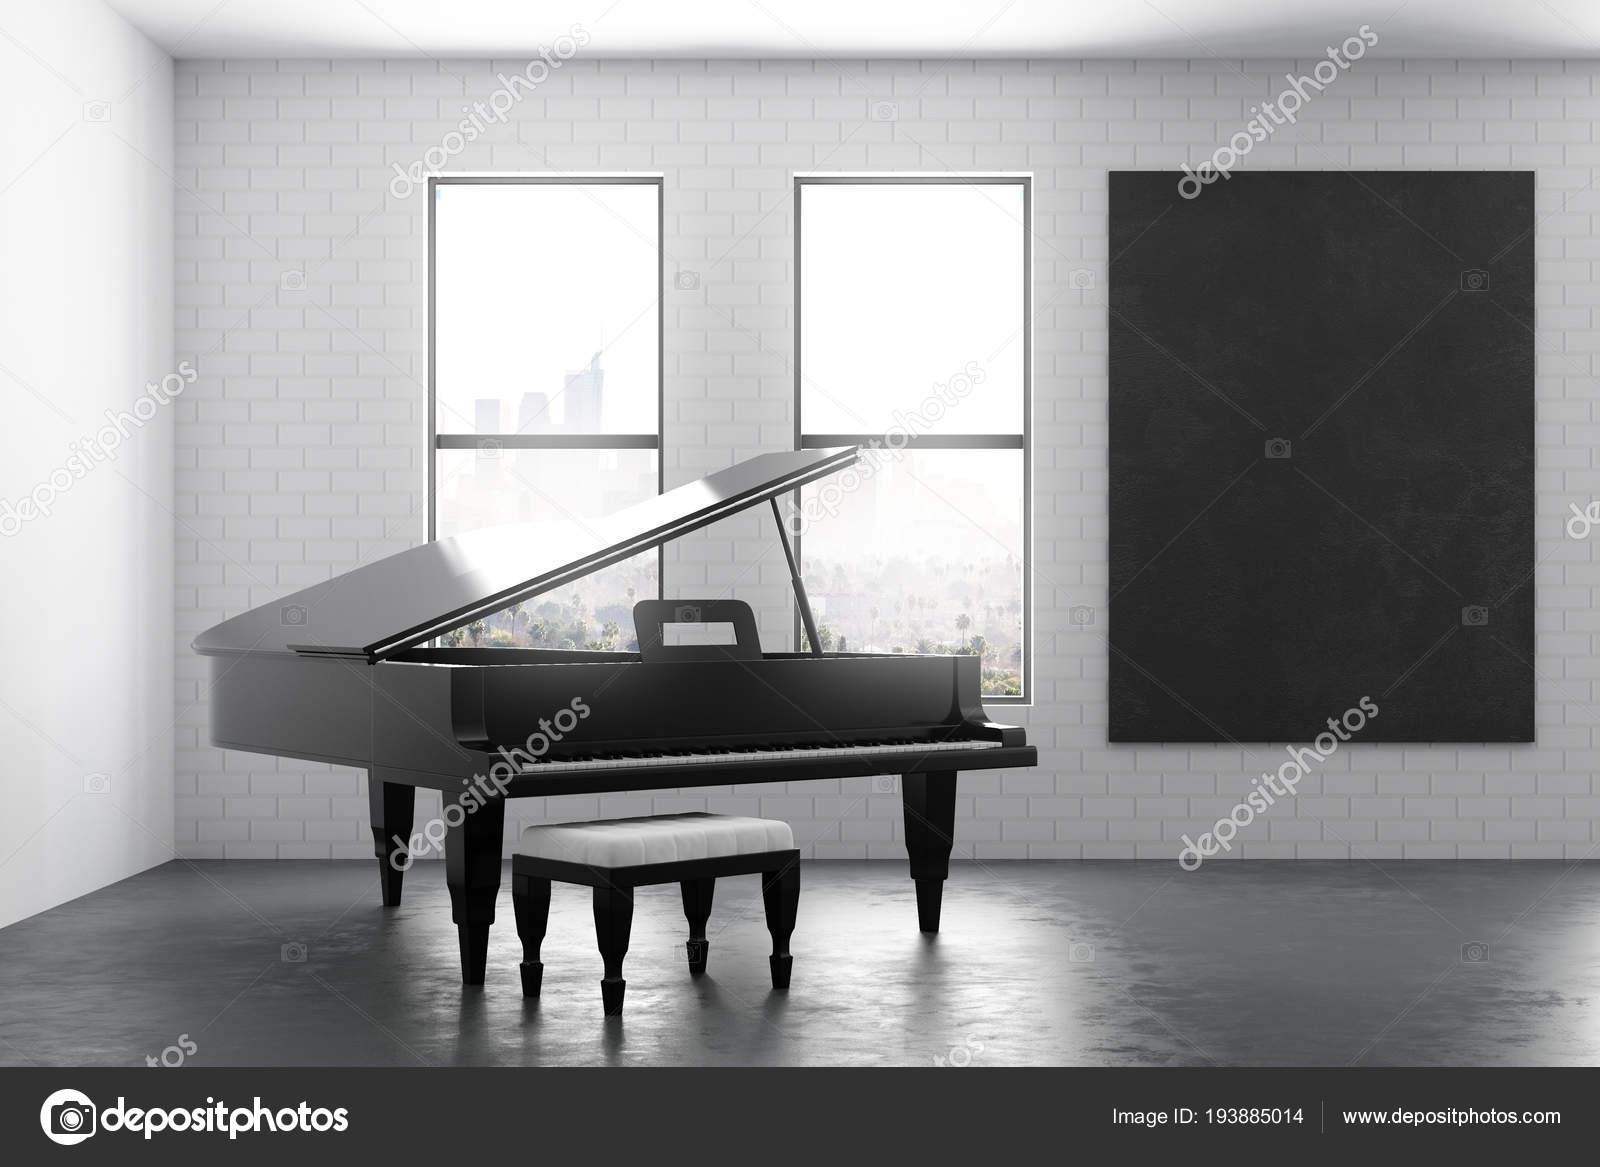 Modernes interieur mit klavier und poster u stockfoto peshkova